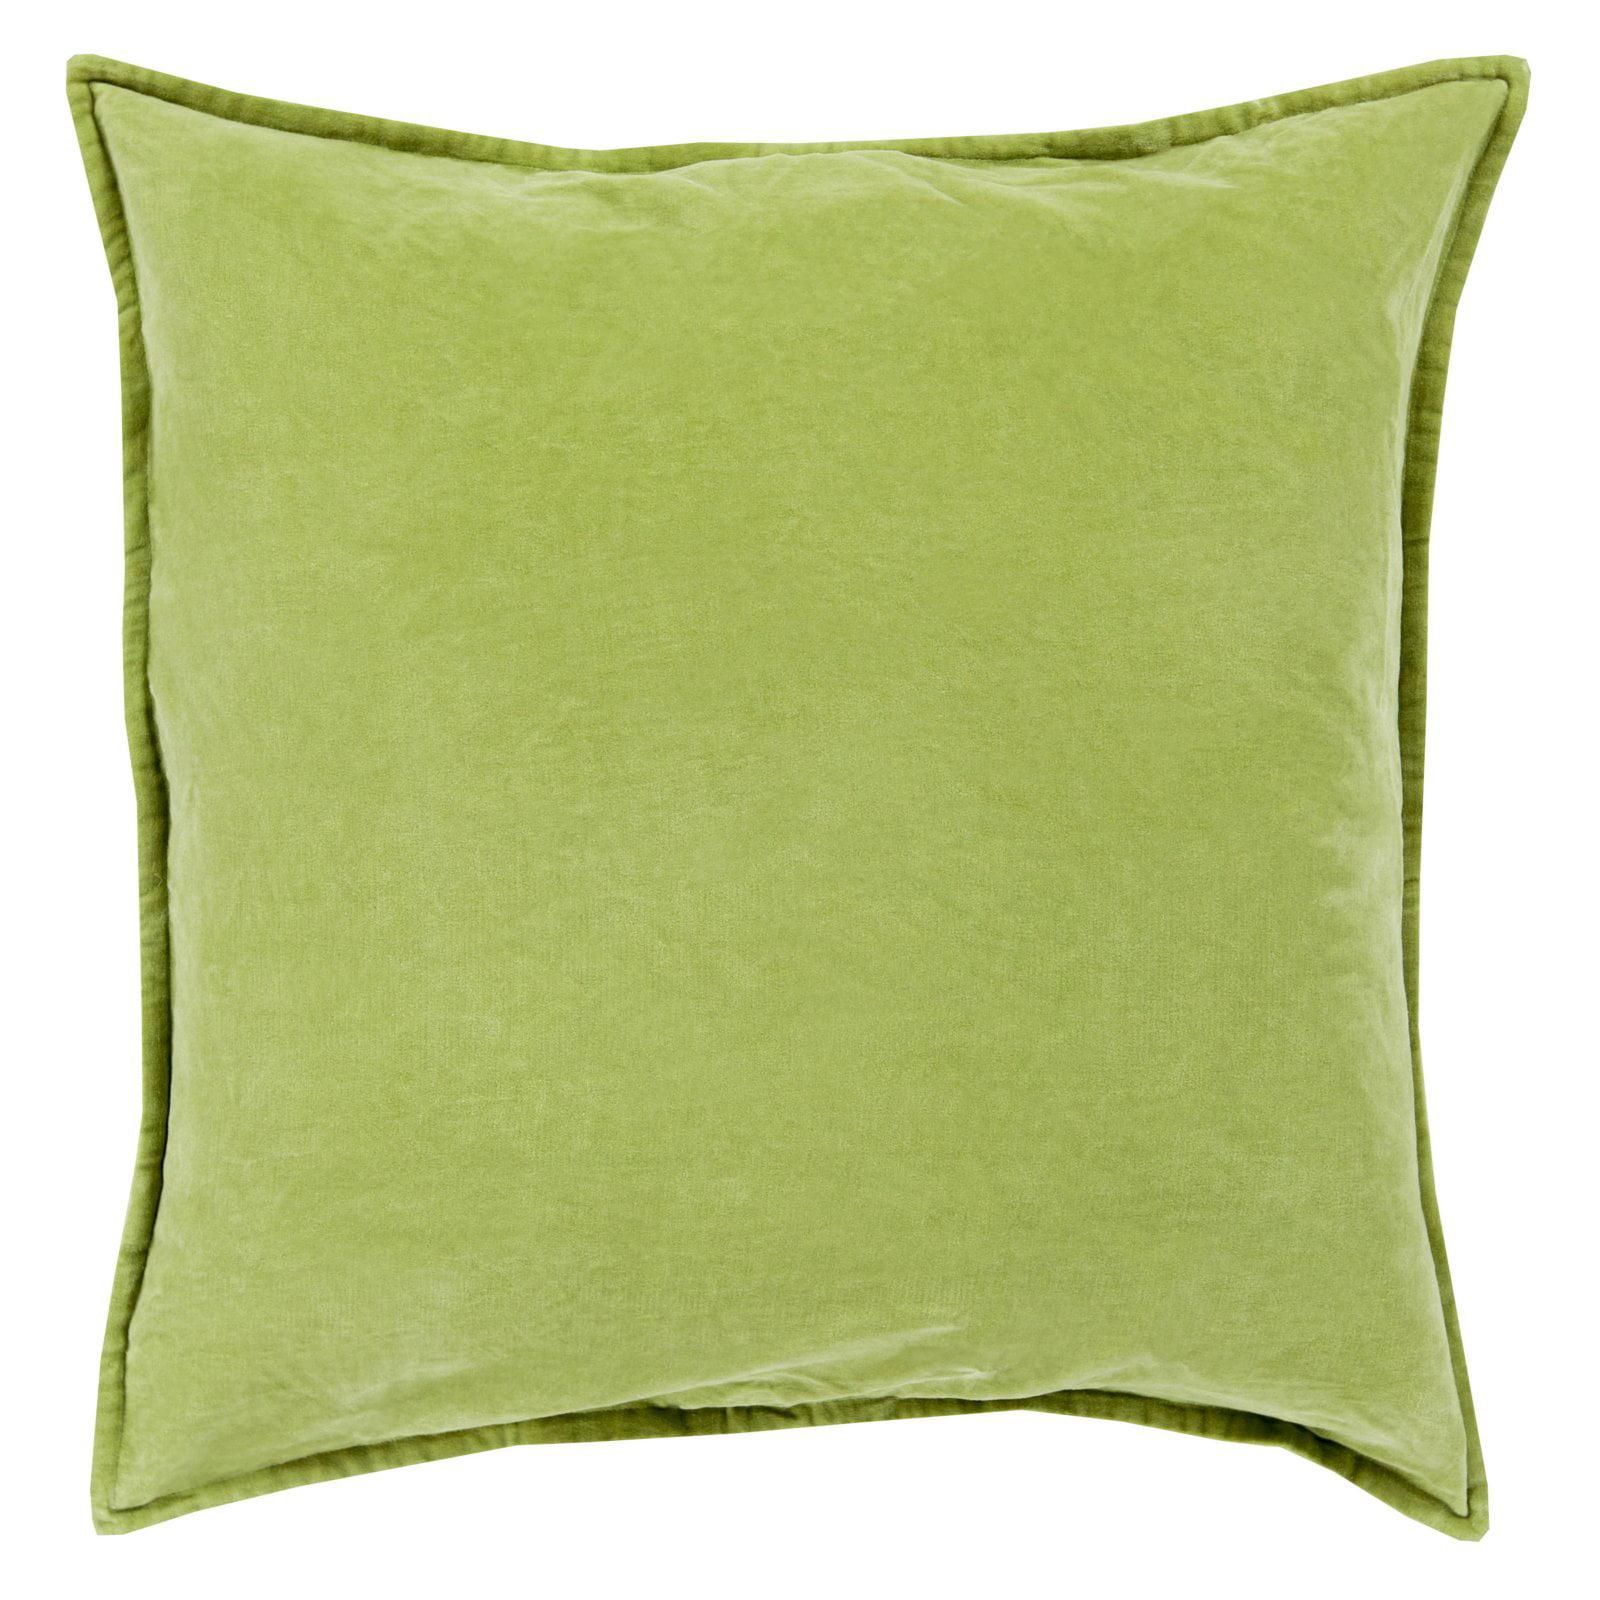 Surya Smooth Velvet Decorative Throw Pillow